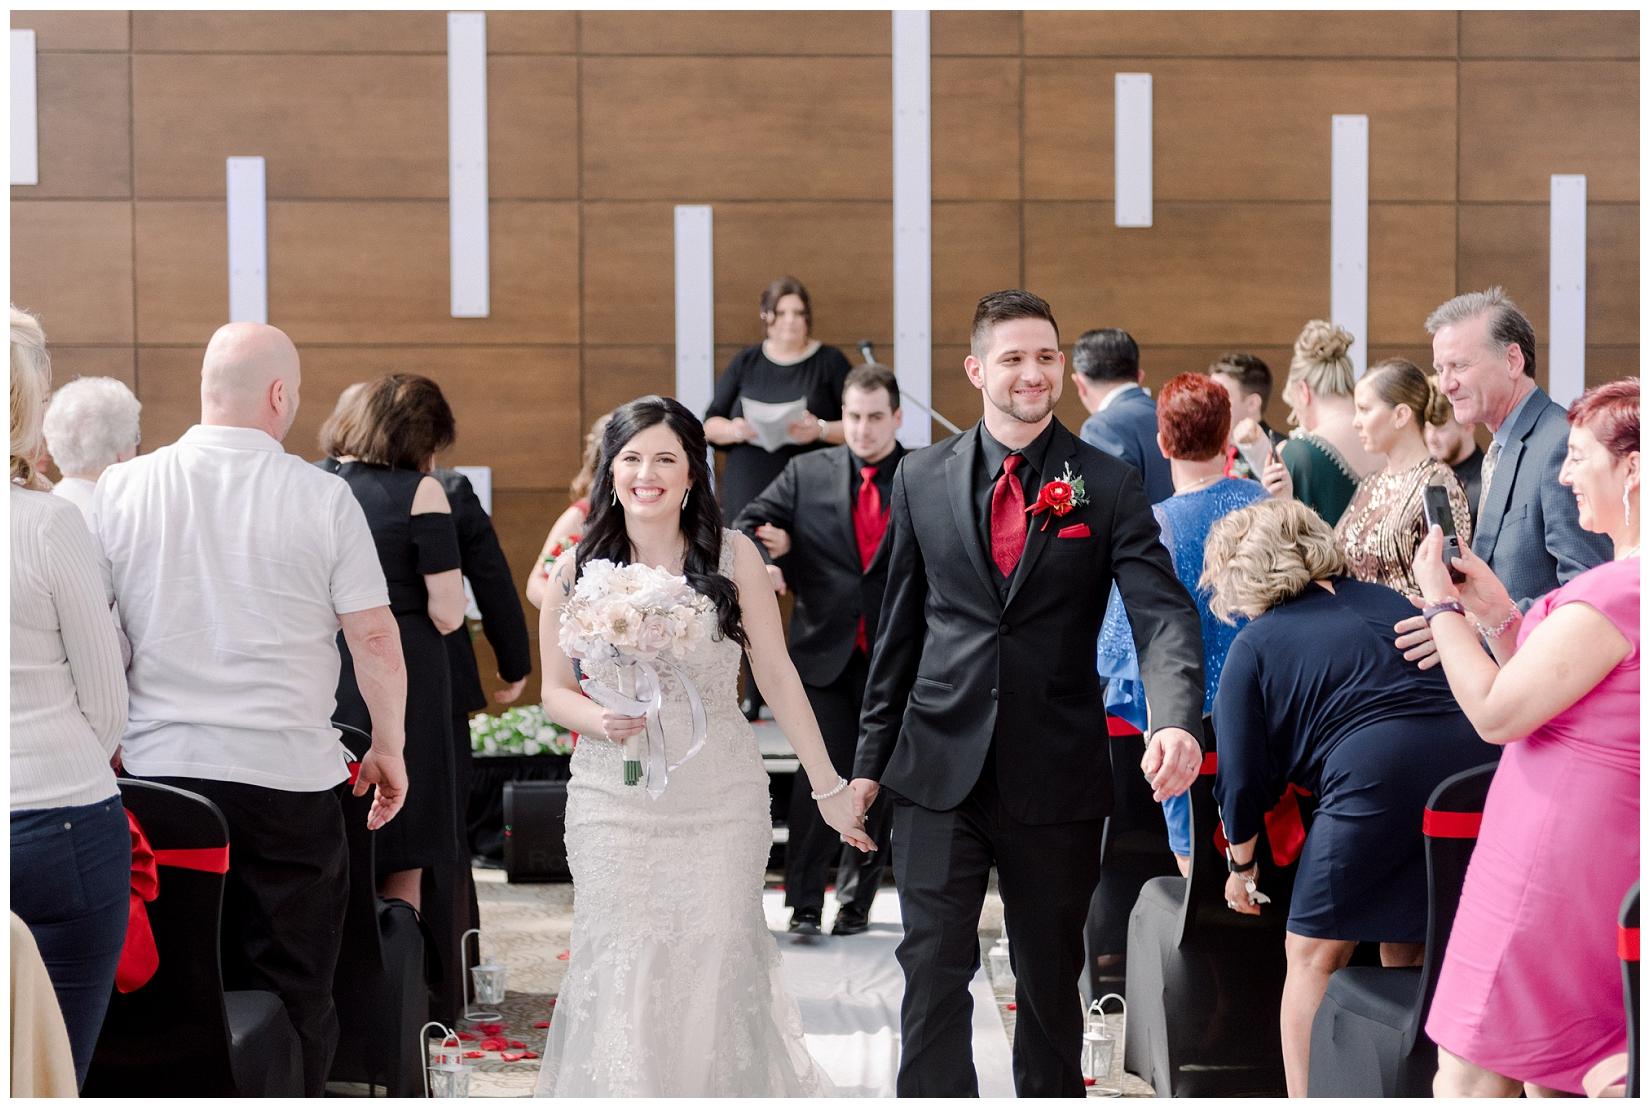 cat-alkire-wedding-photographer-indiana-chicago-indianapolis-fort-wayne_1090.jpg